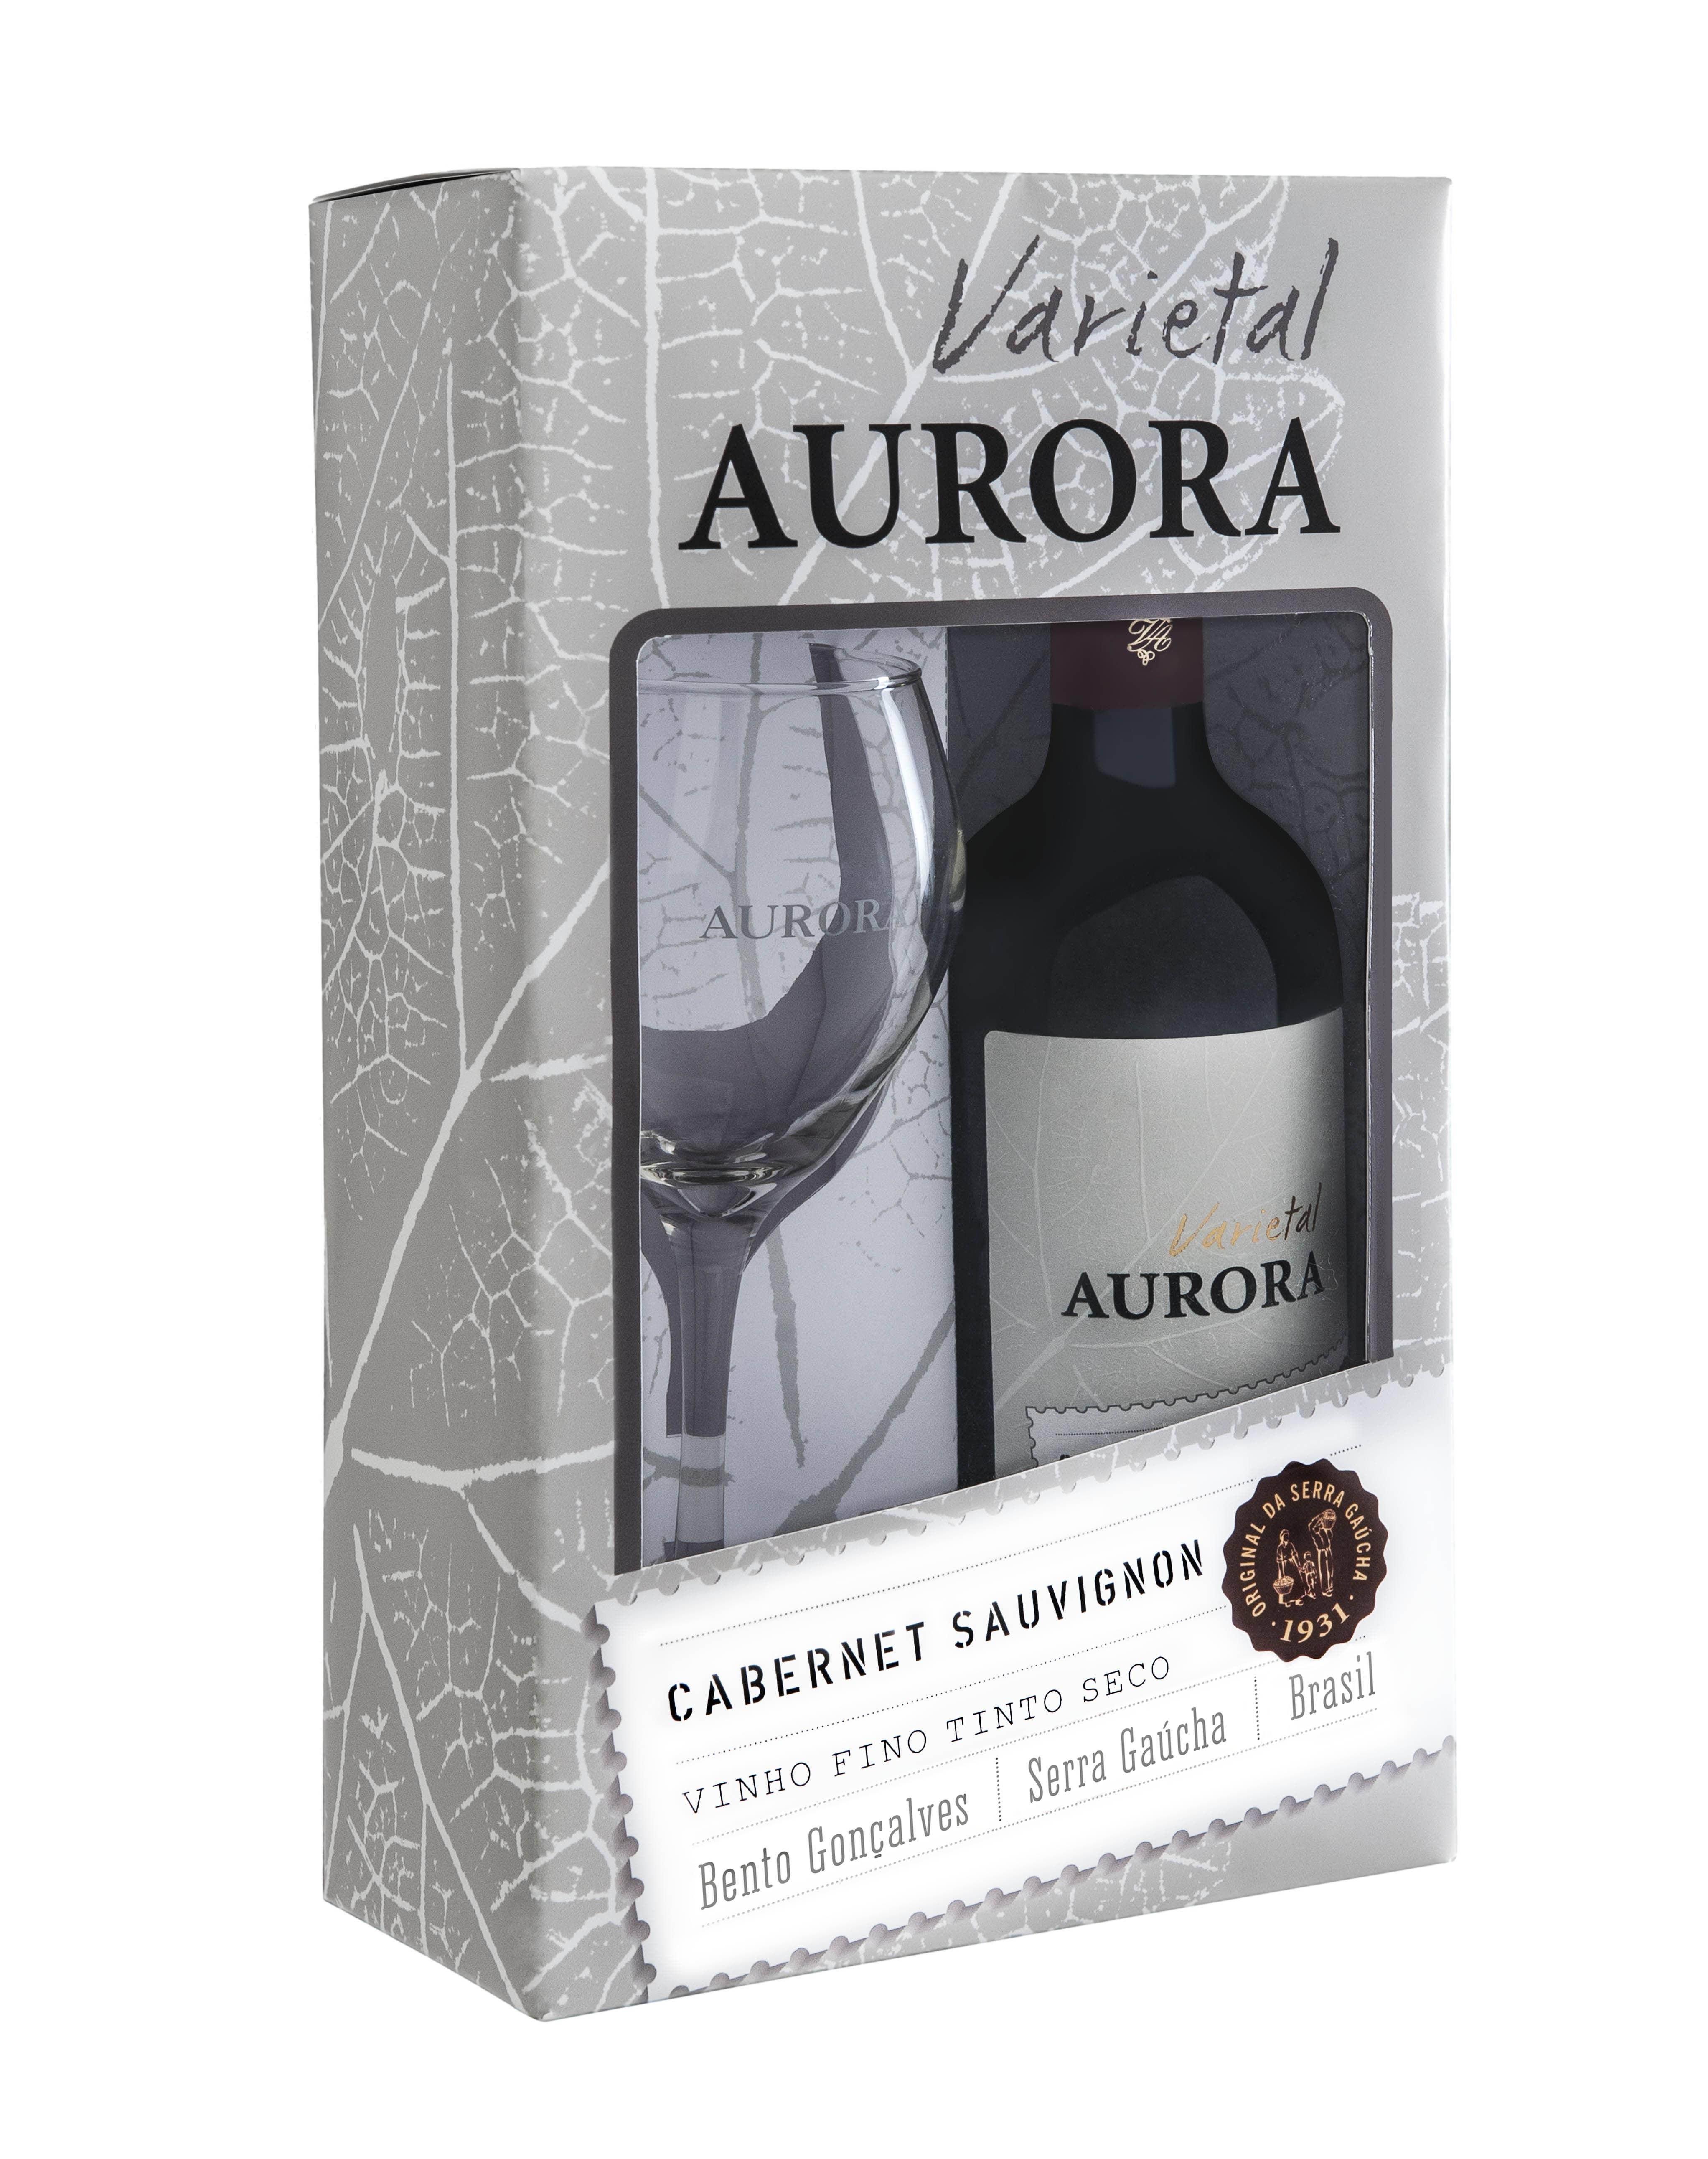 Maleta-Aurora-Varietal-Cabernet-Sauvignon